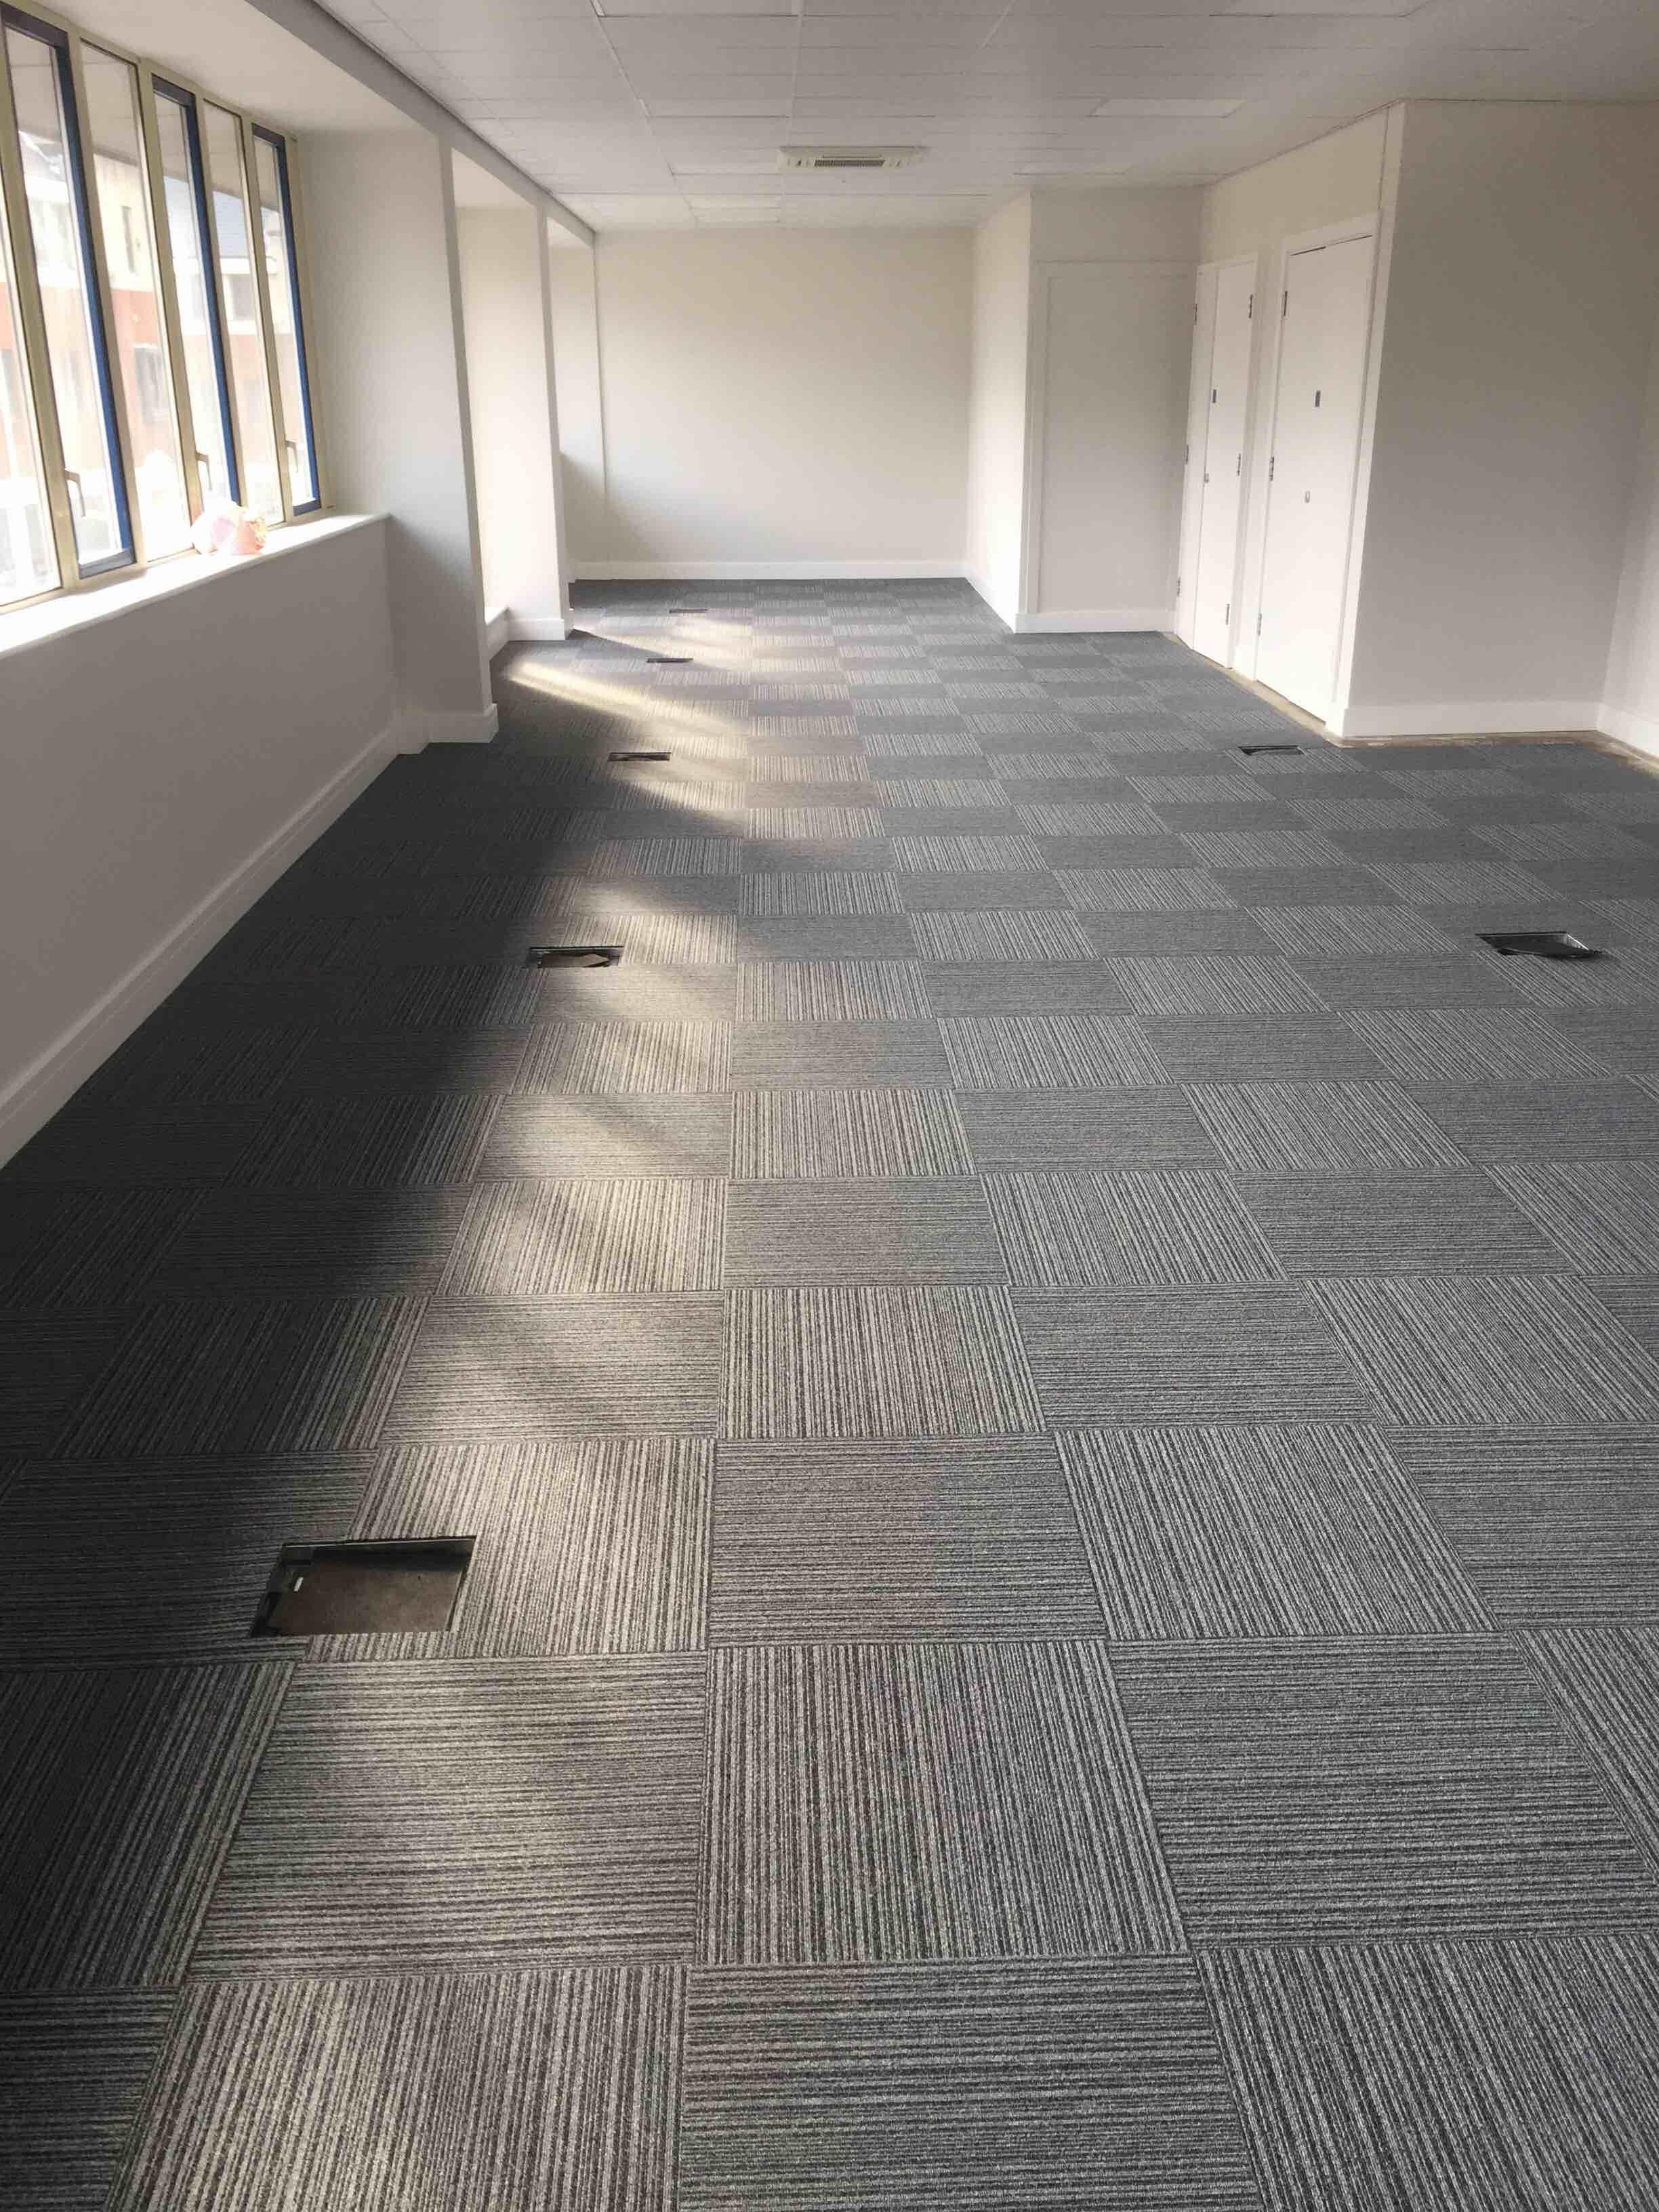 Flooring Dark Grey Color Tessalated Pattern Of Carpet Tiles Create More Interesting Floor Layouts Flooring D Carpet Tiles Stair Runner Carpet Carpet Colors